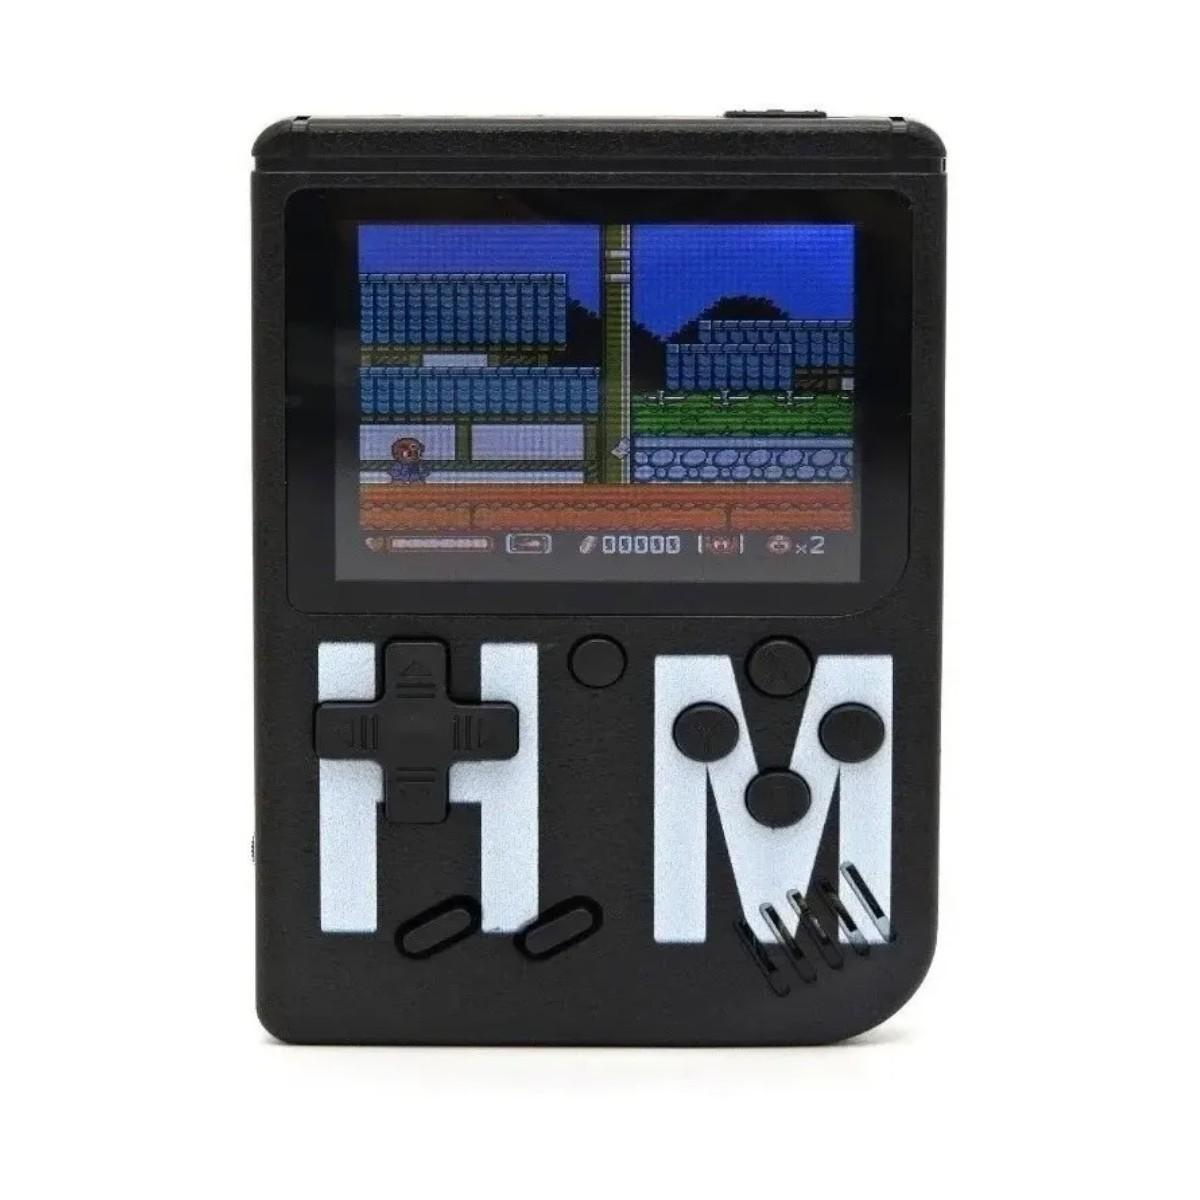 Mini Game Portátil 400 Jogos Tela Grande H'maston Yxj-02